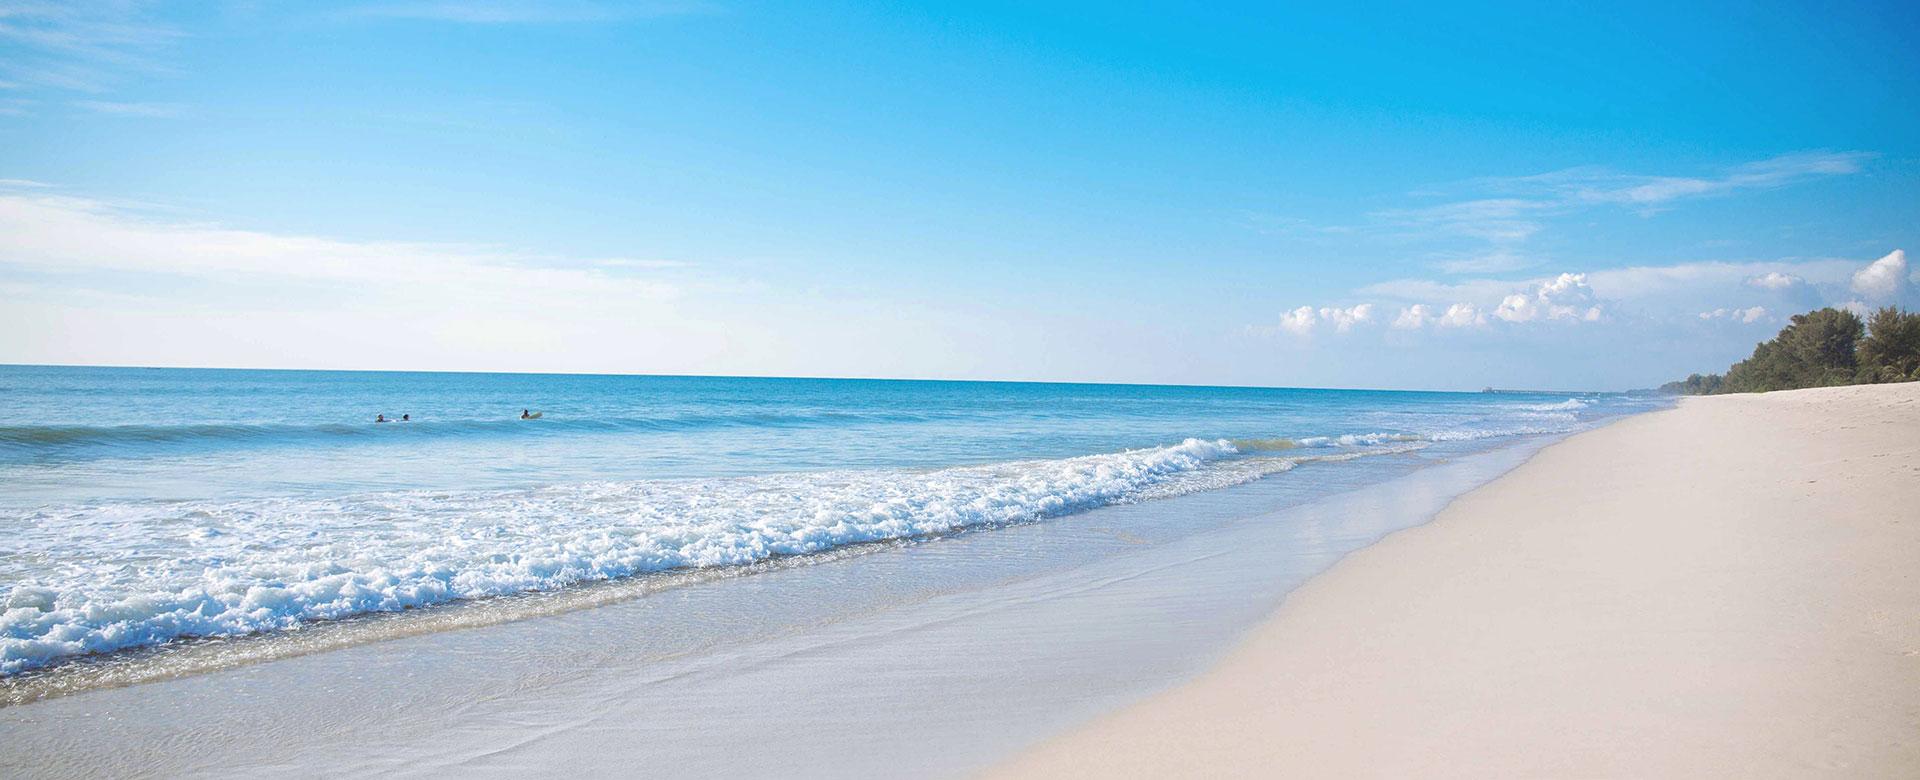 10-Facilities-Baba-Beach-Club-Luxury-Hotel-Phuket-by-Sri-Panwa